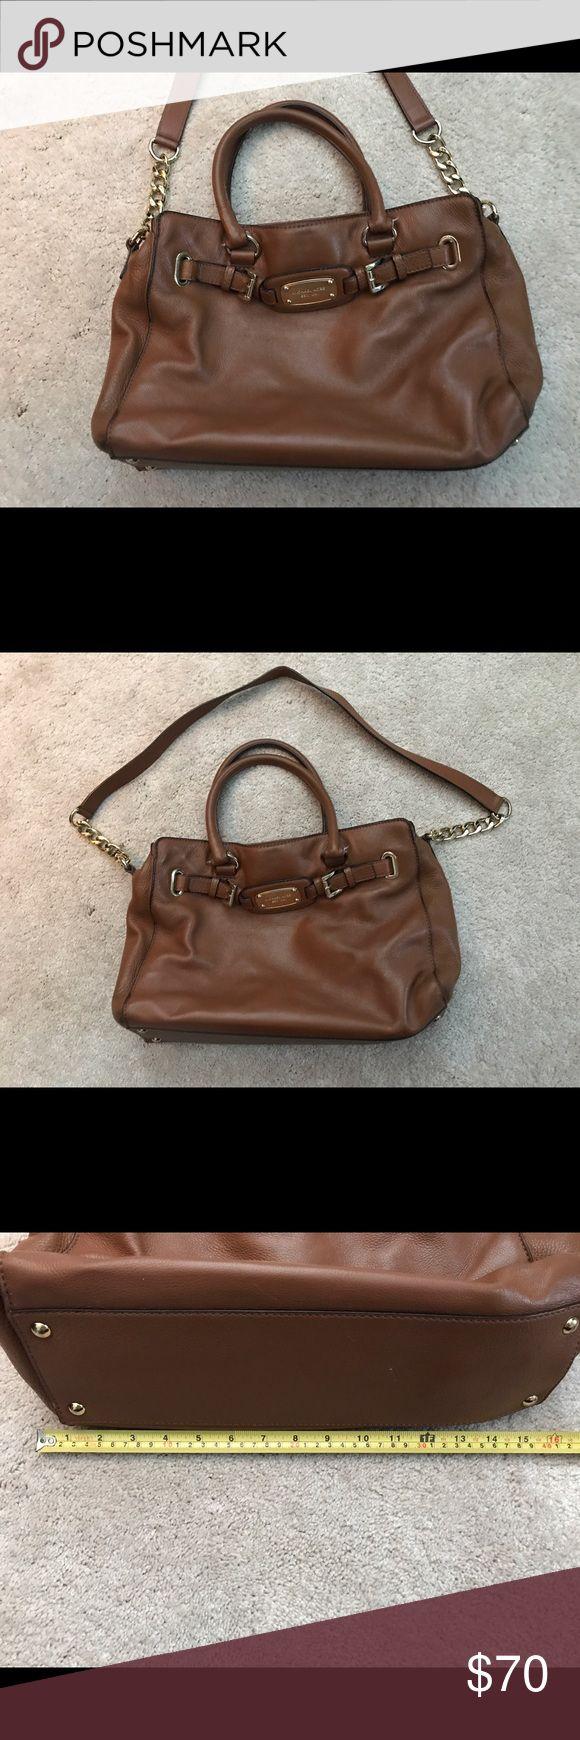 Michael Kors shoulder bag Brown Michael kors handbag with shoulder strap. Great condition, no marks or tears! KORS Michael Kors Bags Shoulder Bags